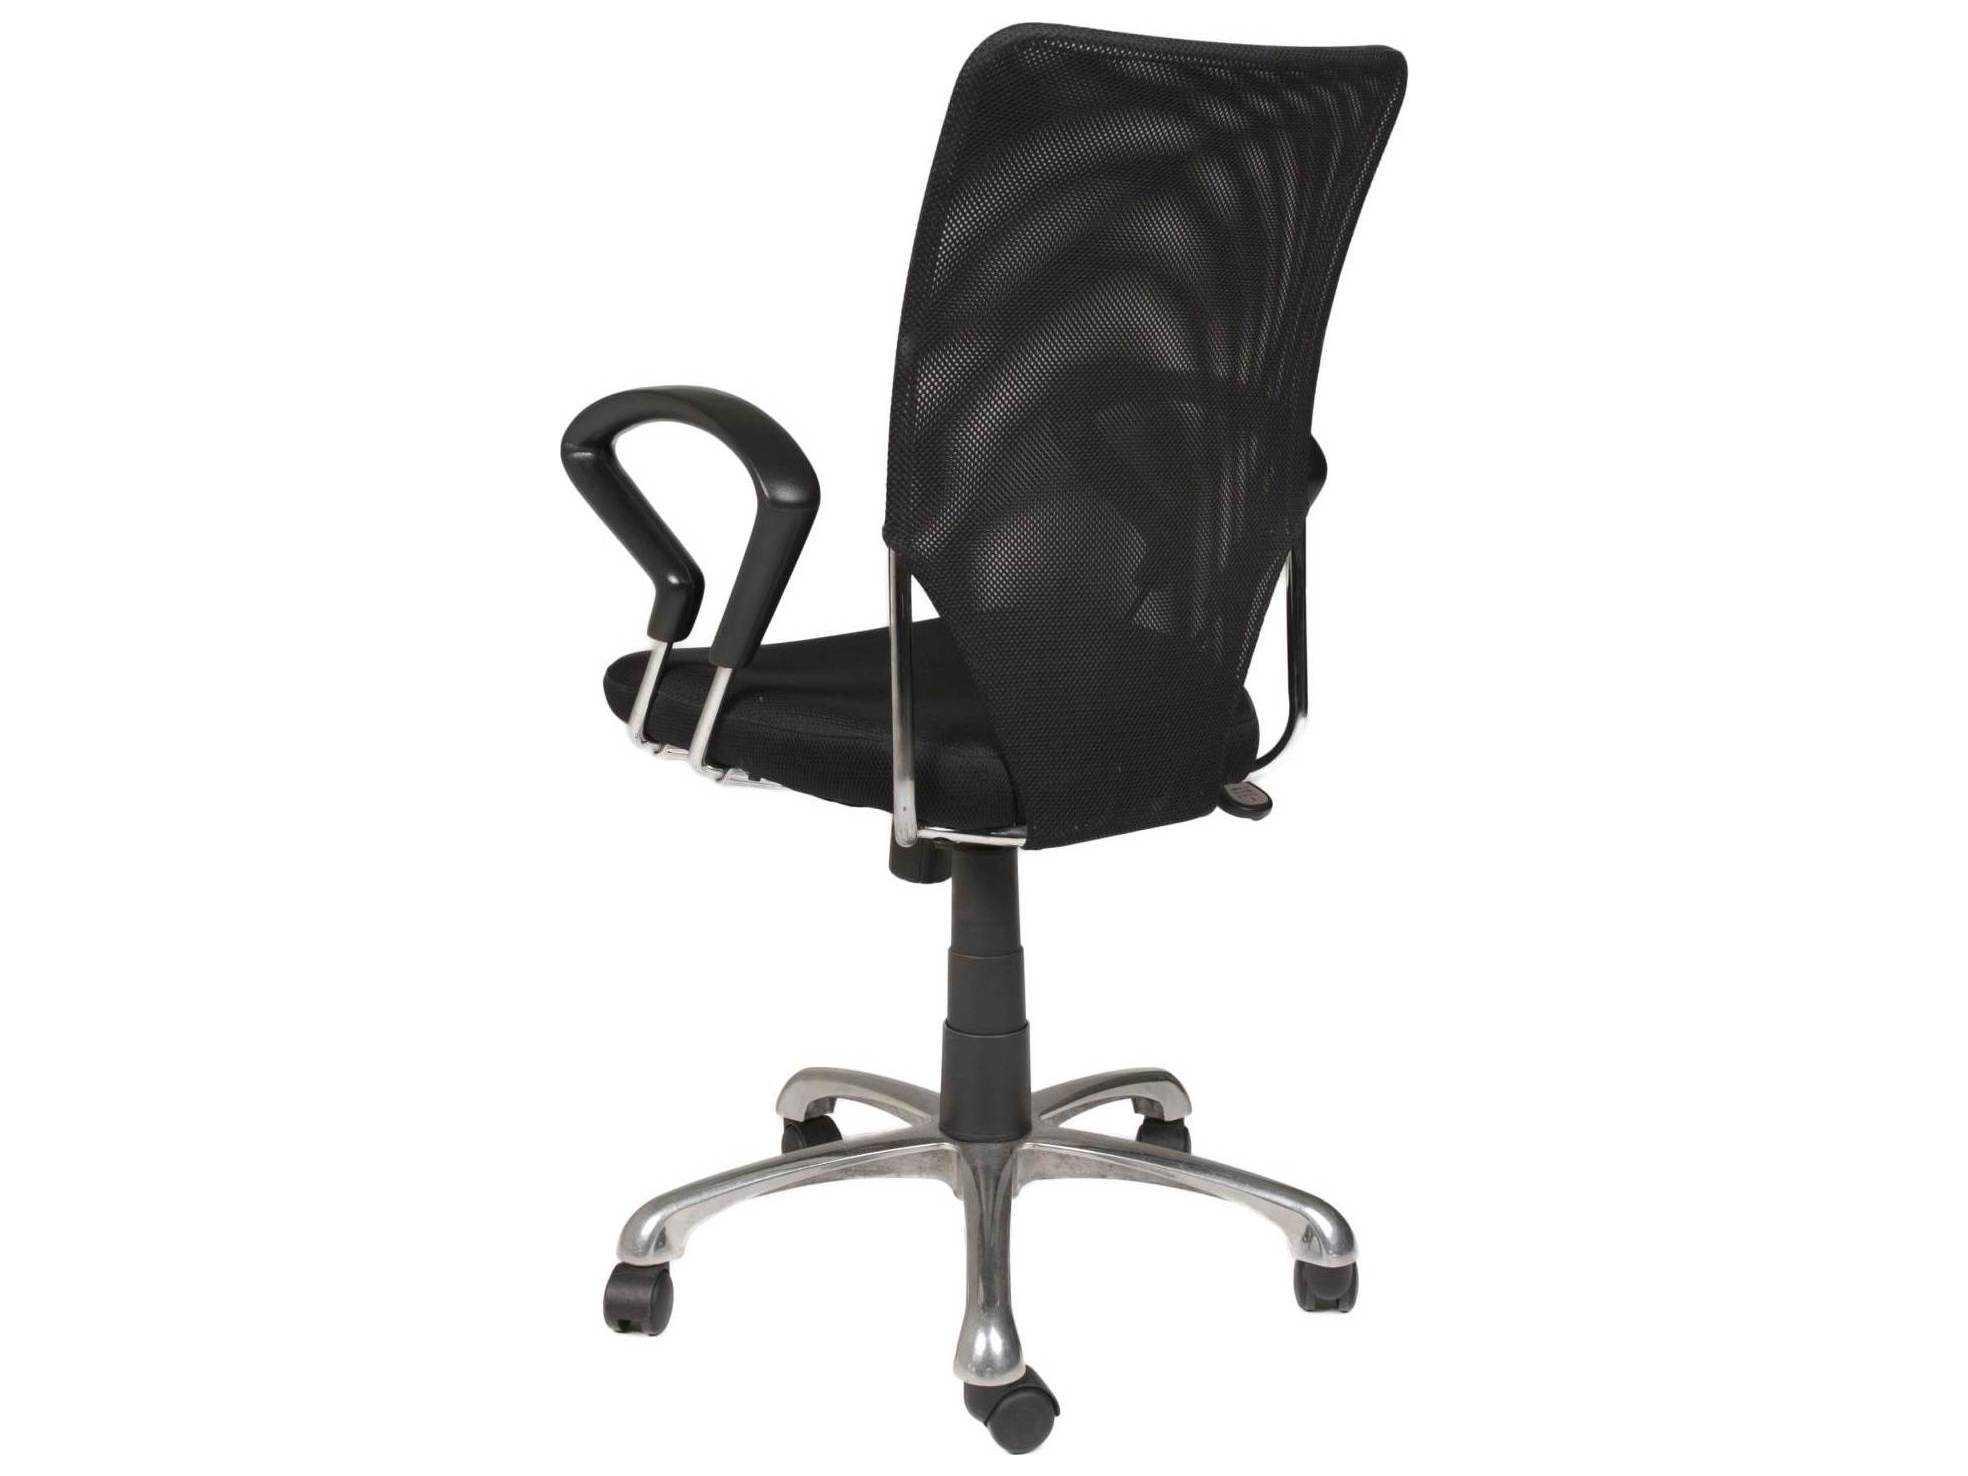 Star International Furniture Sedia Stilo Chrome And Black Mesh Office Chair